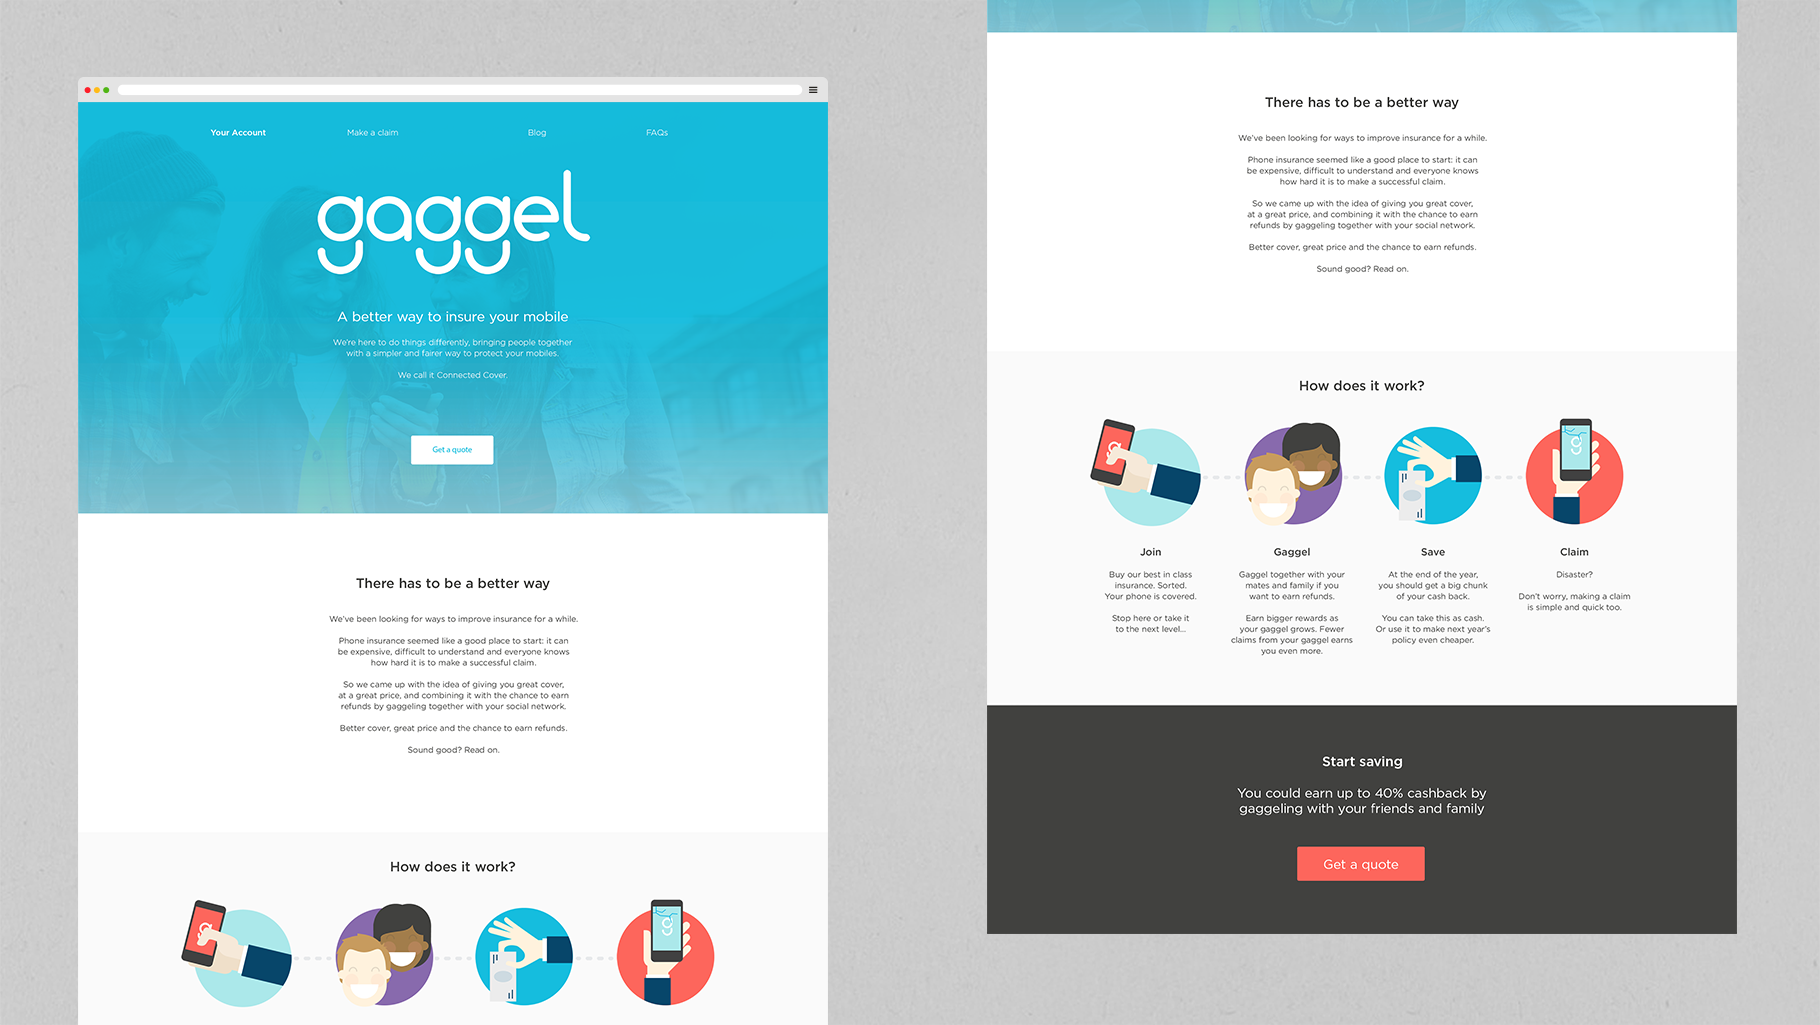 GAGGEL_WEB_2X.png